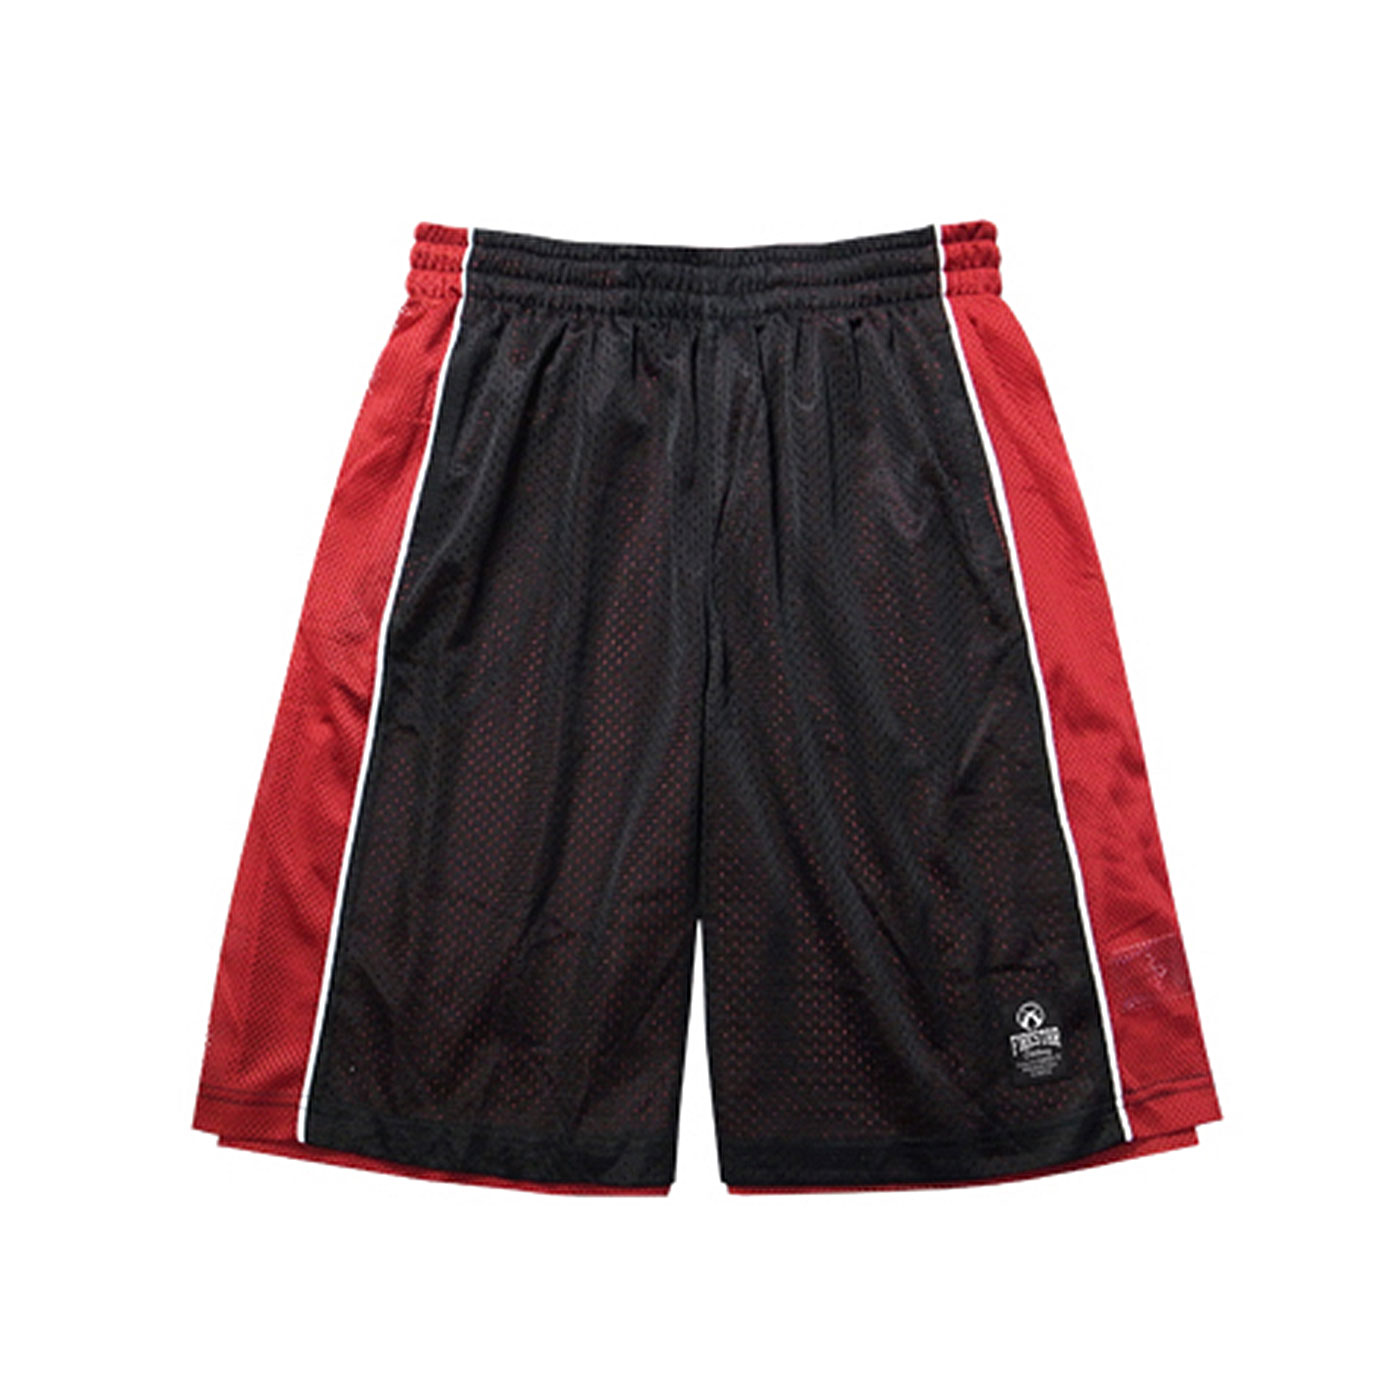 FIRESTAR 籃球褲 B3702-10 - 黑紅